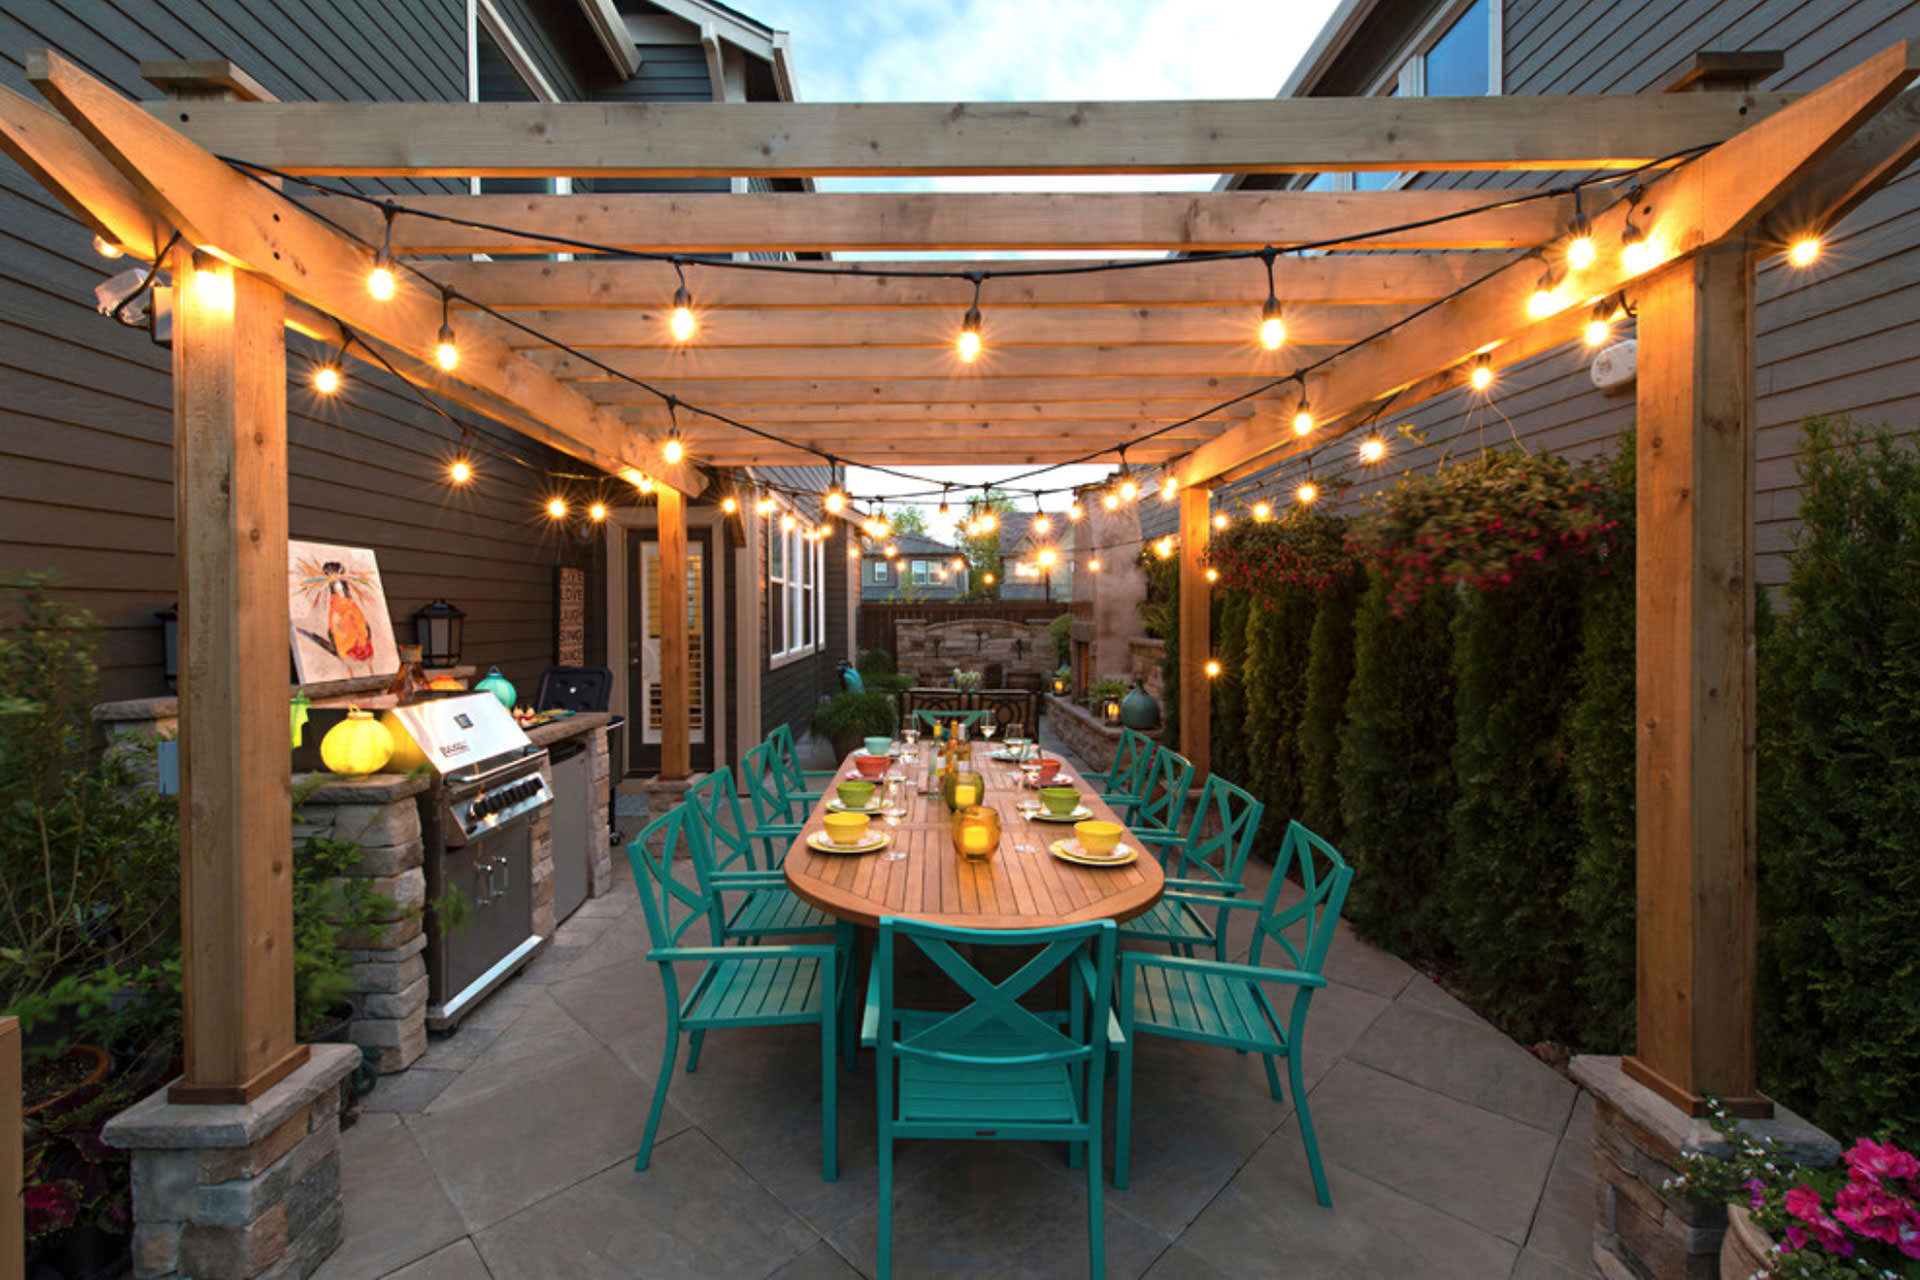 Five Pergola Lighting Ideas to Illuminate Your Outdoor Space on Backyard String Light Designs id=49106